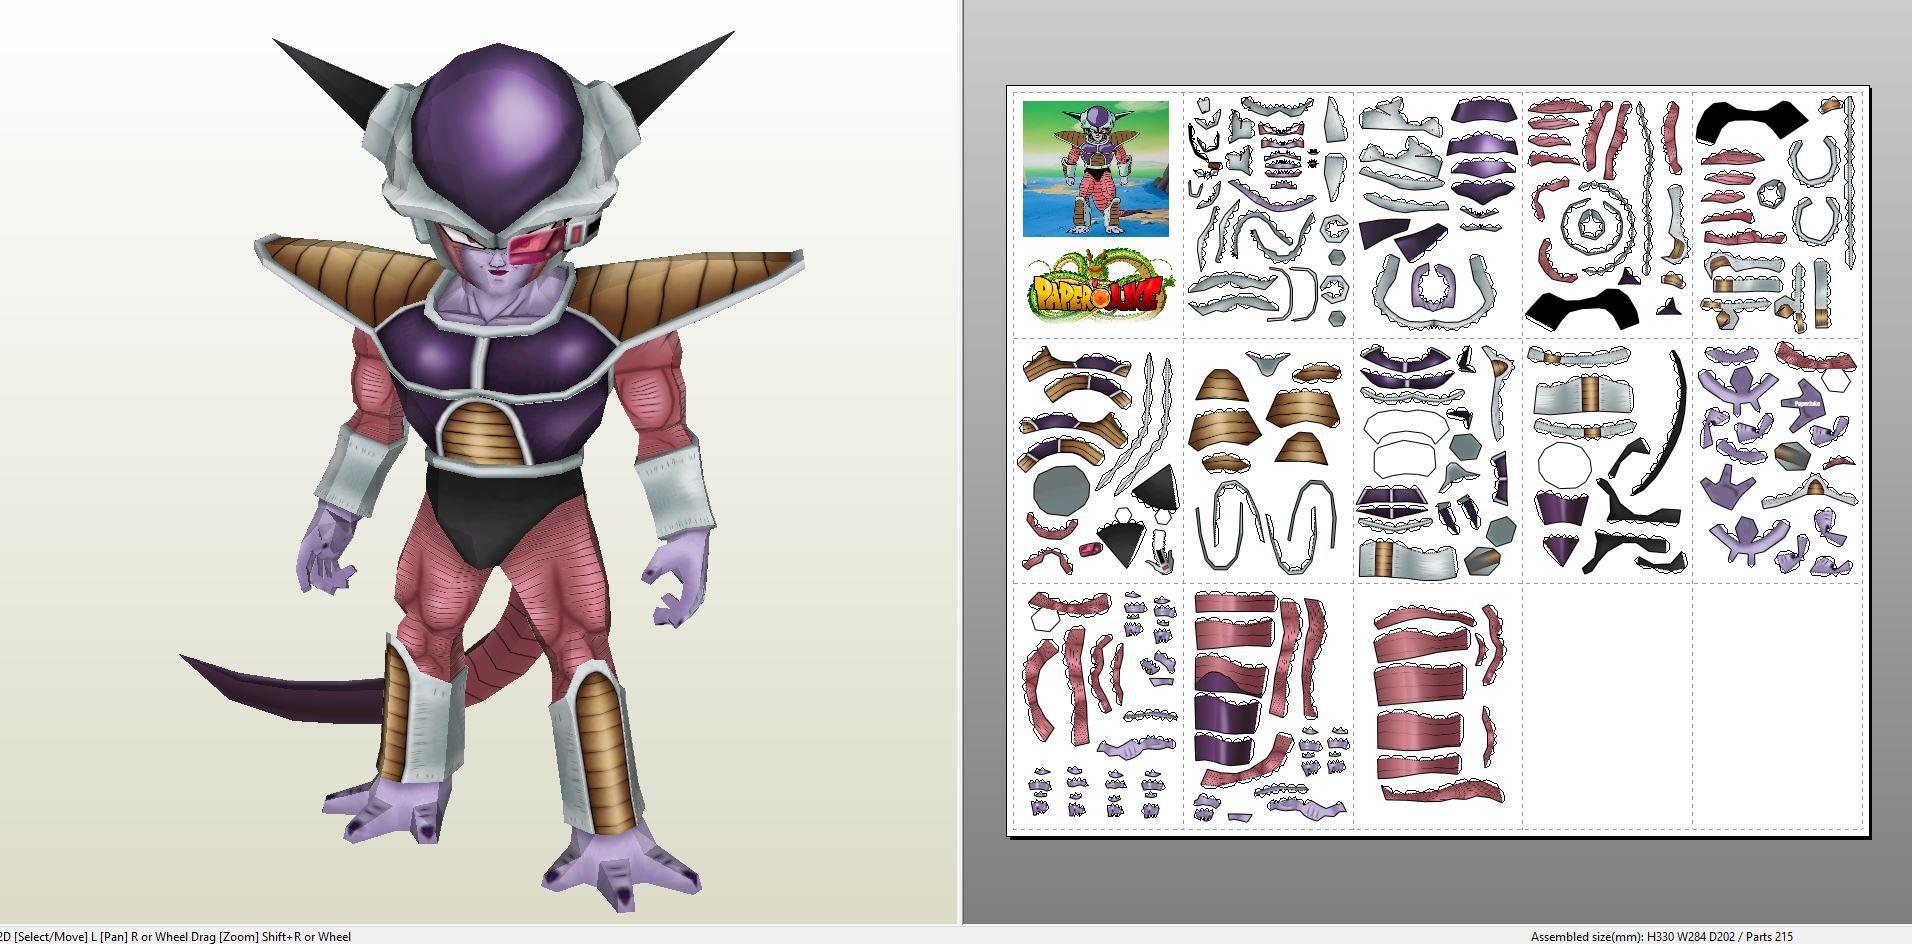 Papercraft Pdo File Template For Dragonball Z Freezer Hd